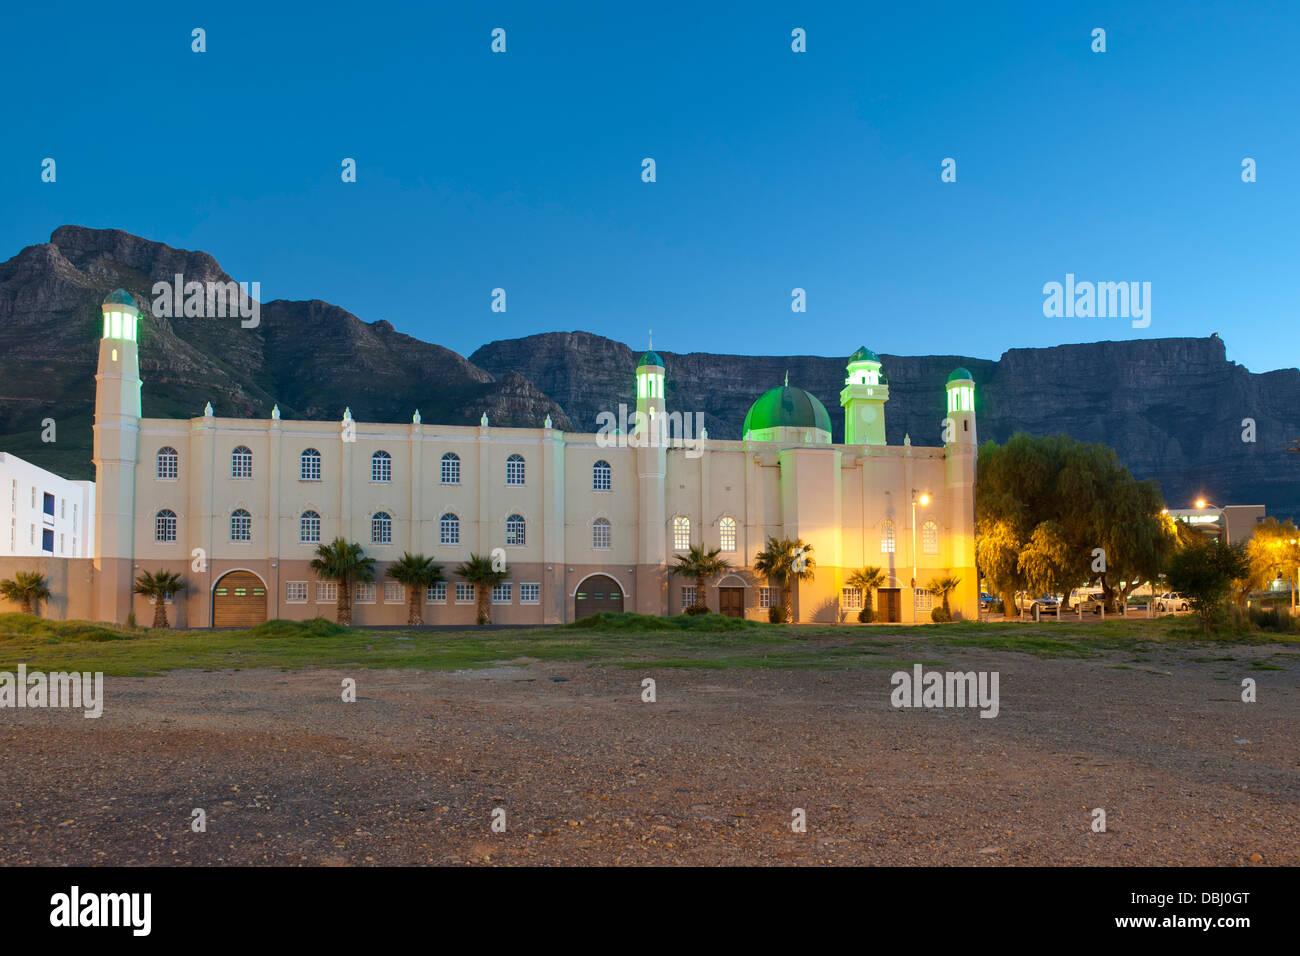 Zeenatul Islam Masjid mosque in the Zonnebloem district of Cape Town, South Africa. - Stock Image